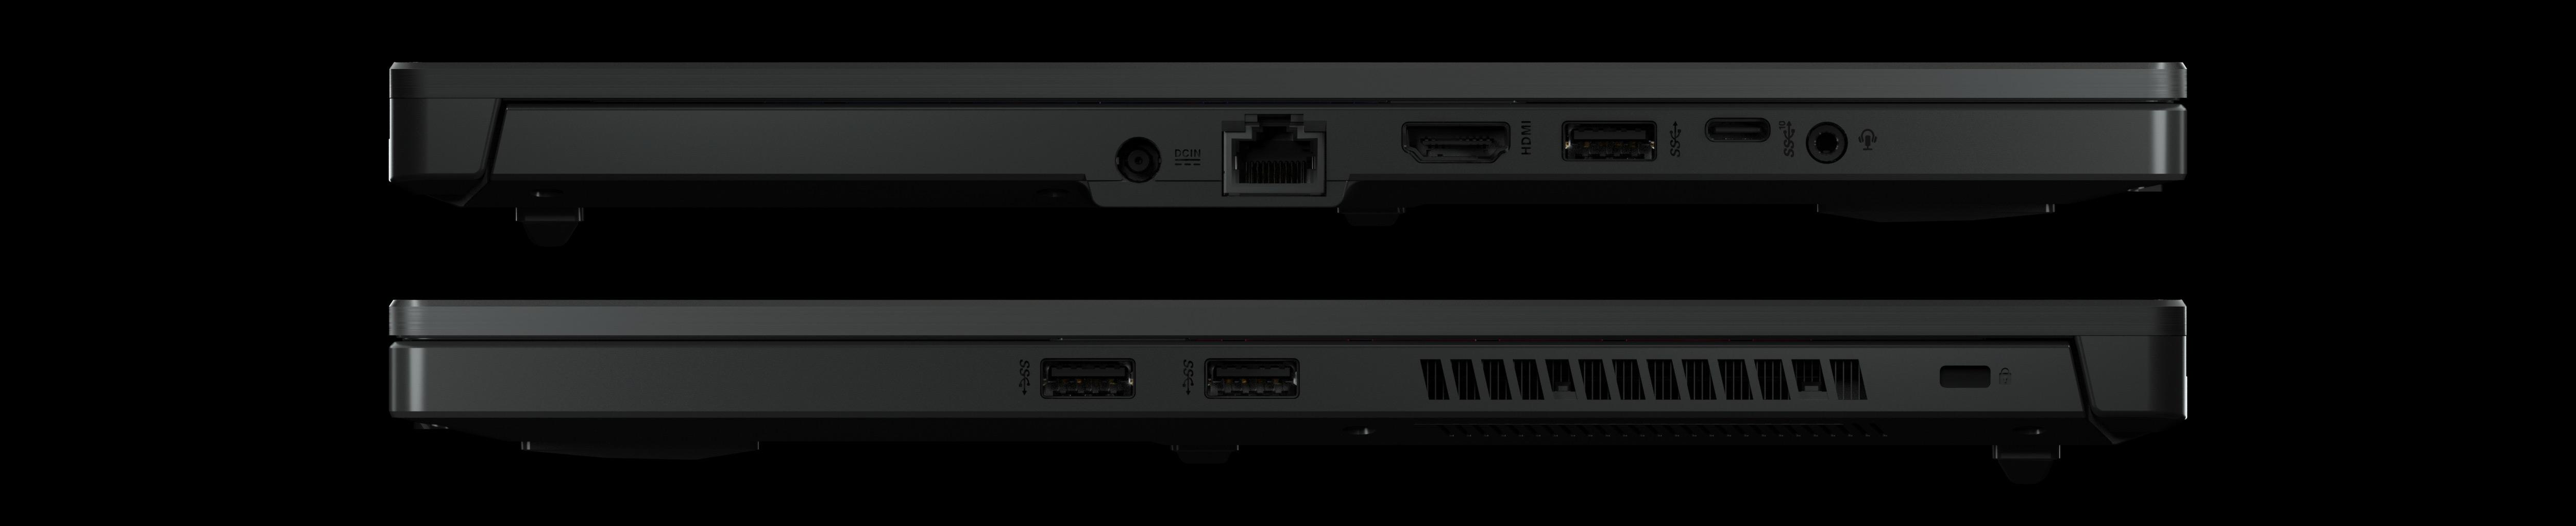 ROG-Zephyrus-G-GA502_Ports